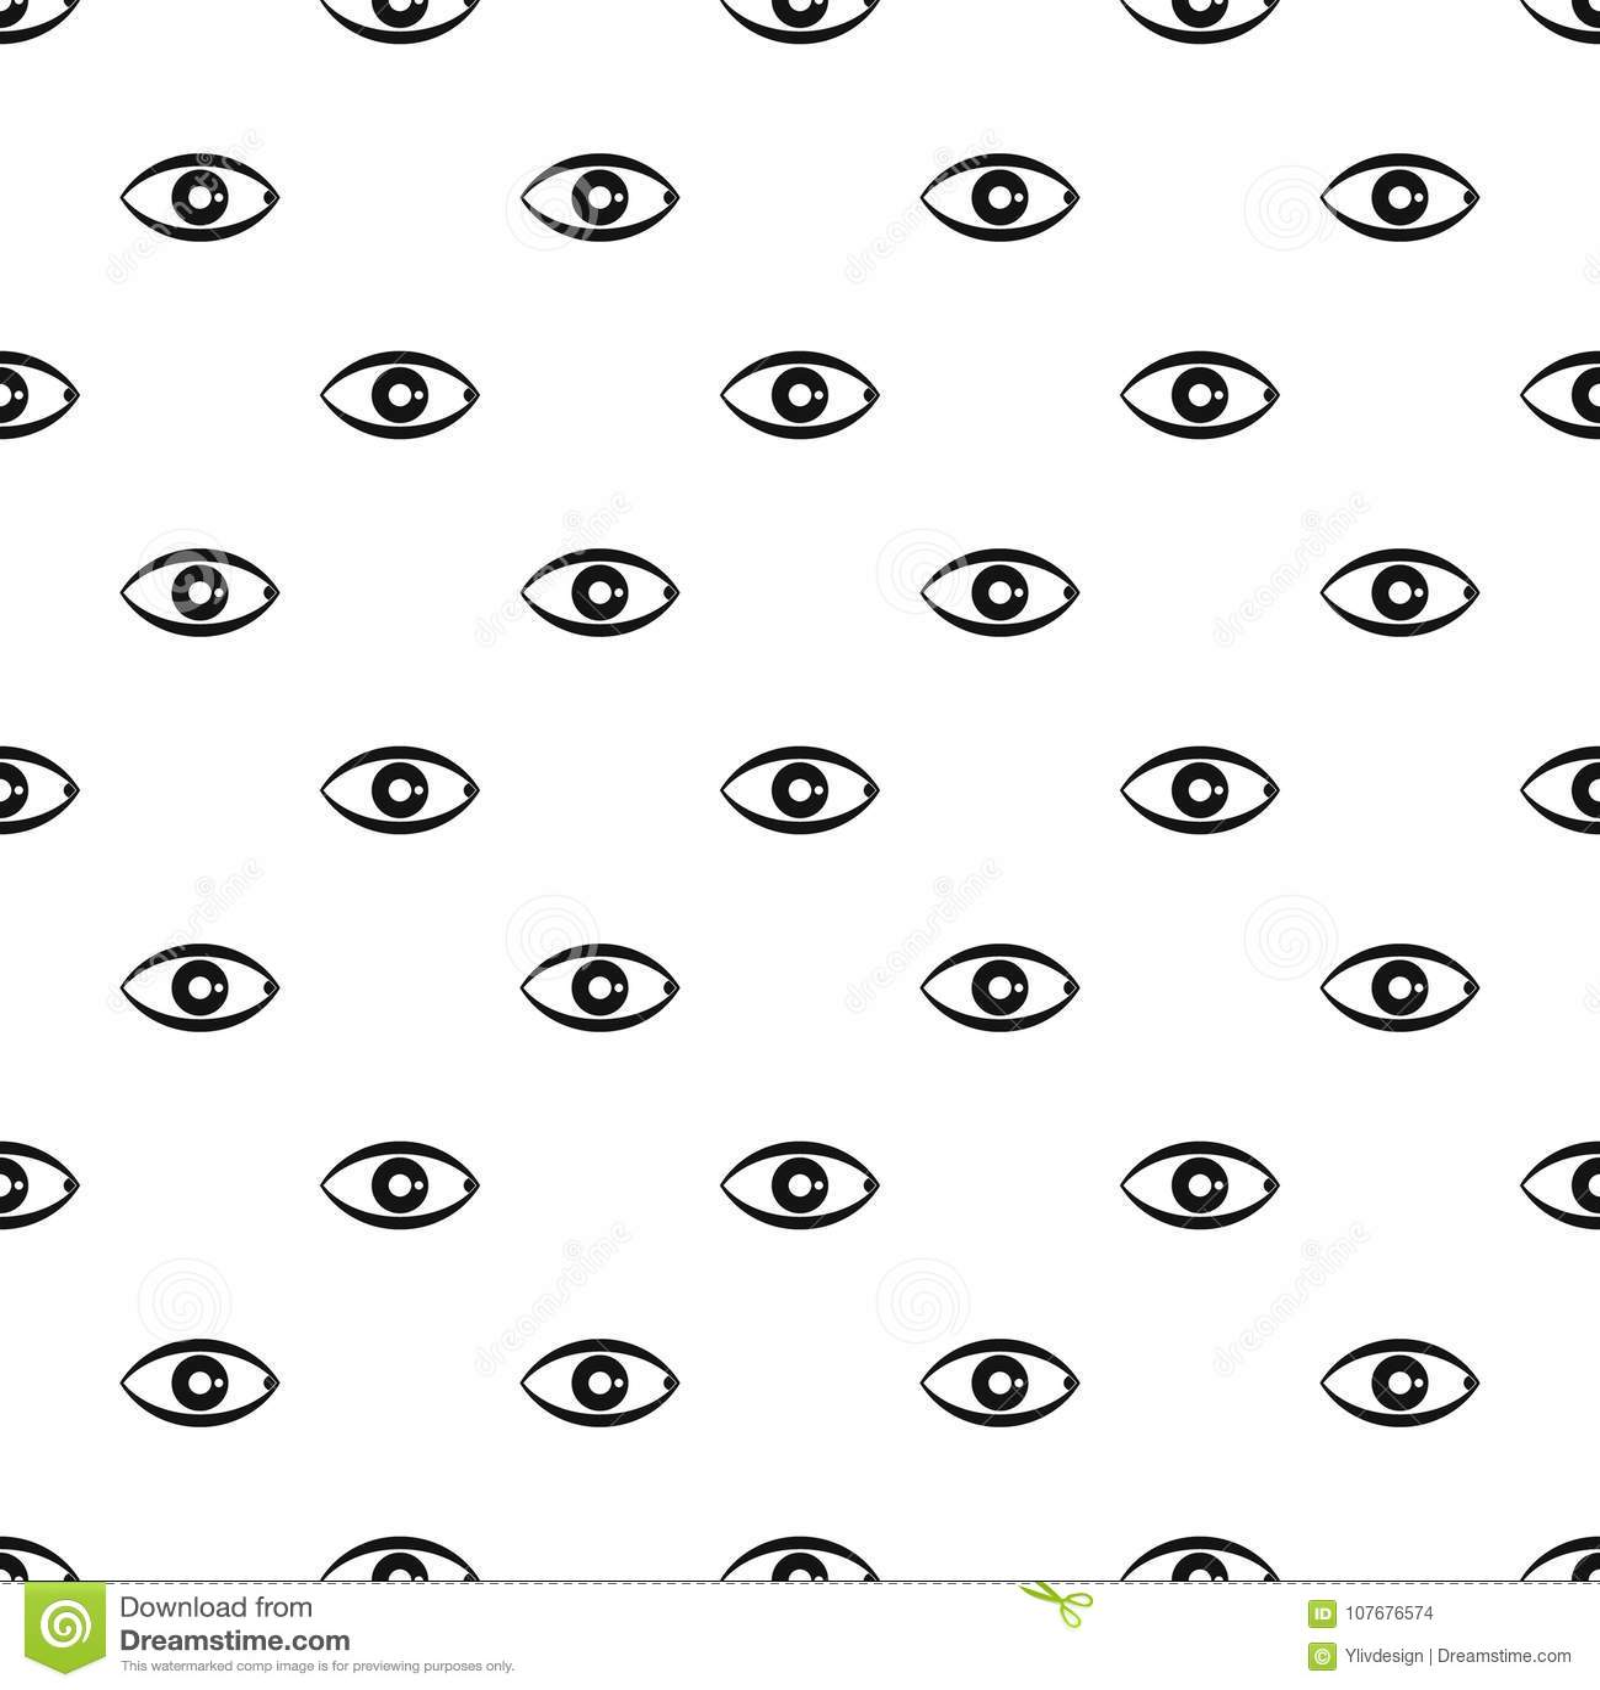 human eye pattern vector stock vector. illustration of abstract